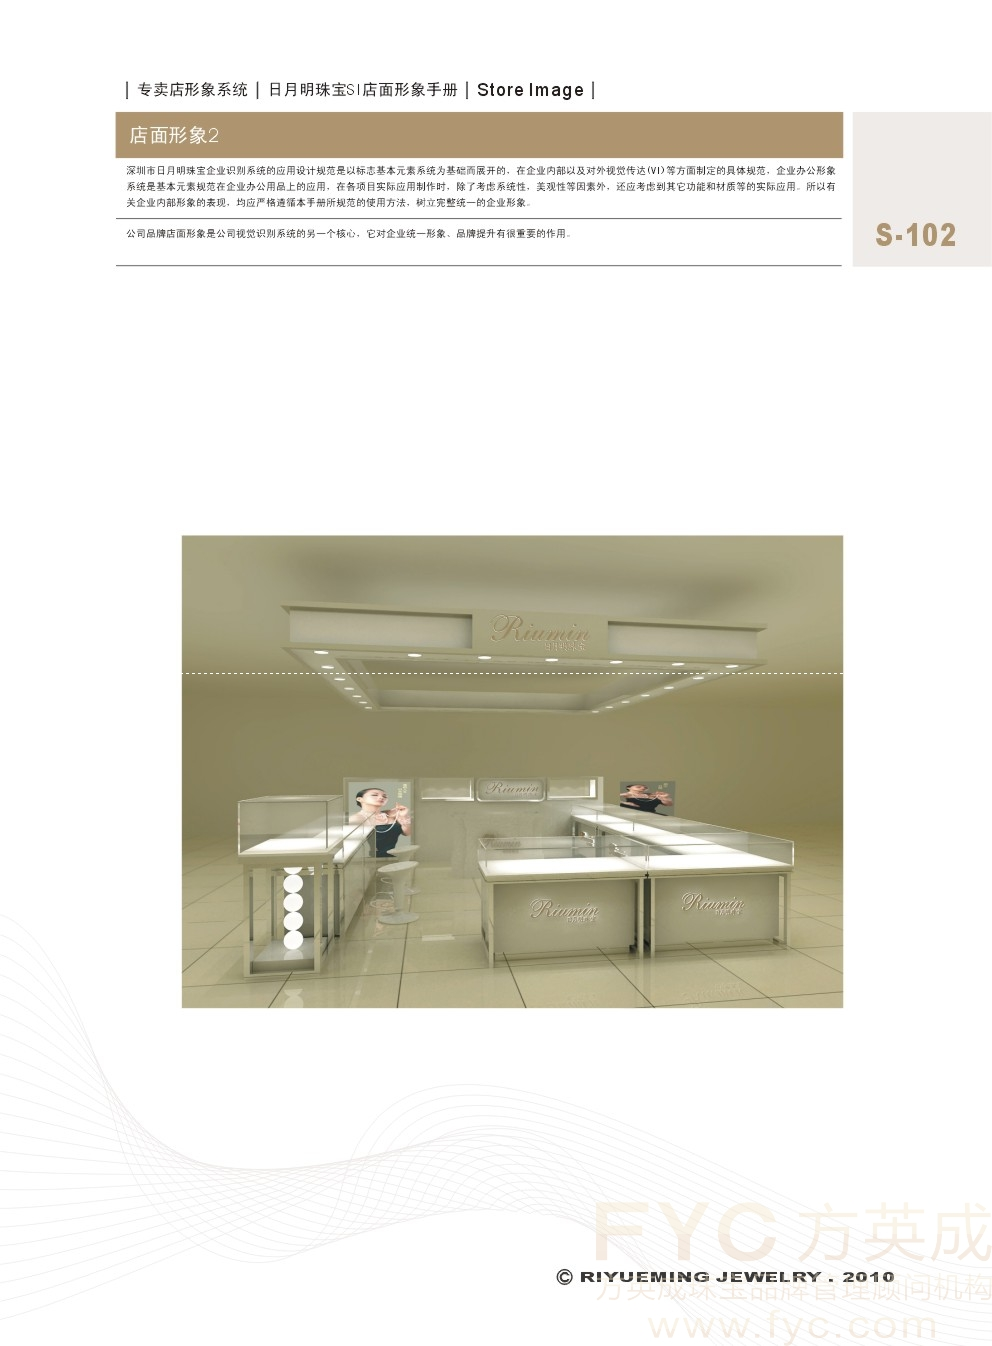 s102.jpg